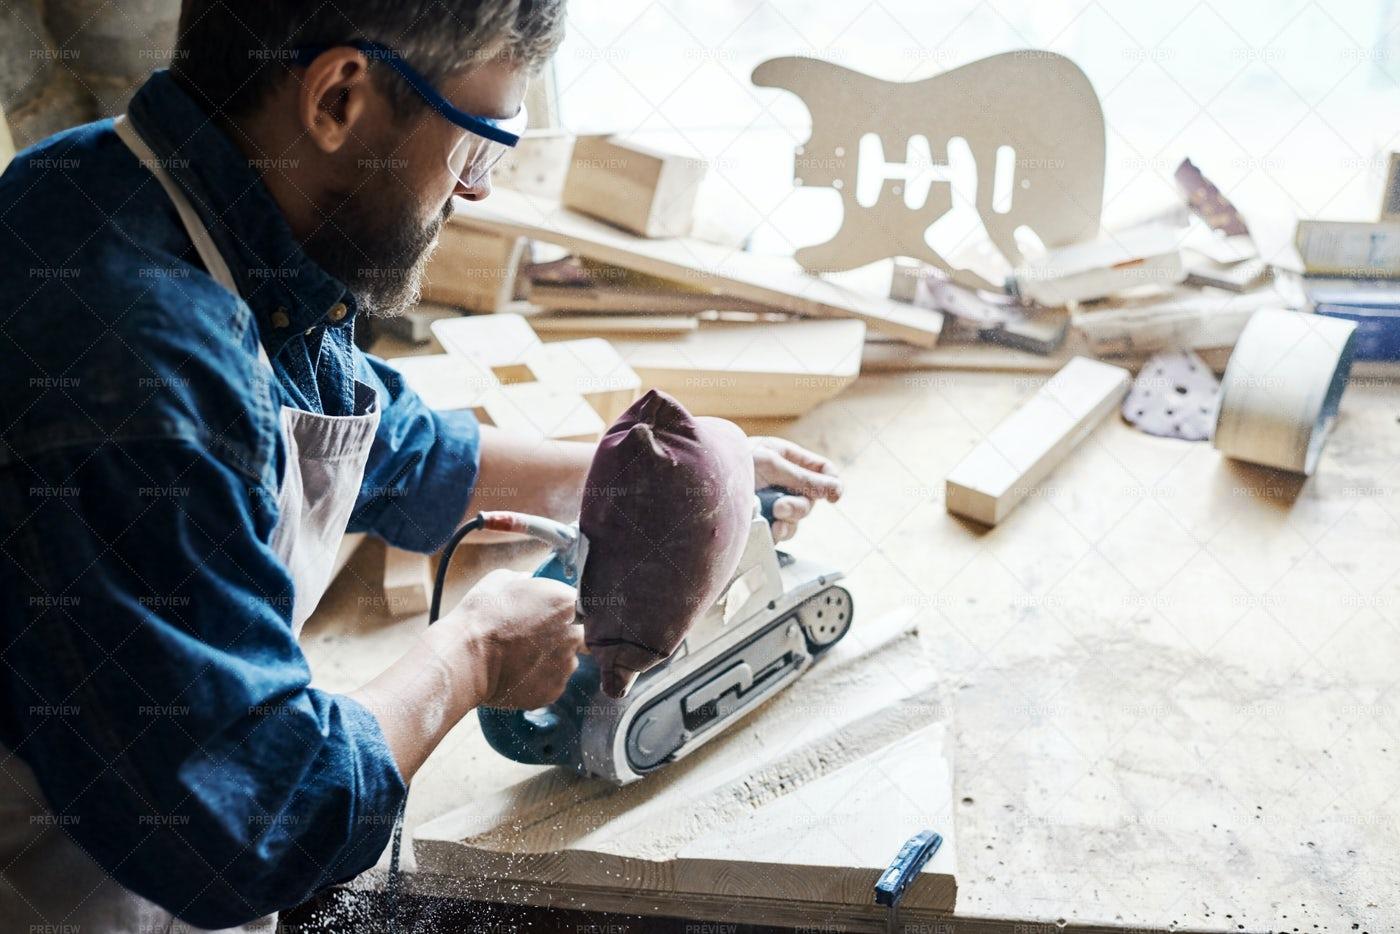 Mature Craftsman Making Wooden...: Stock Photos